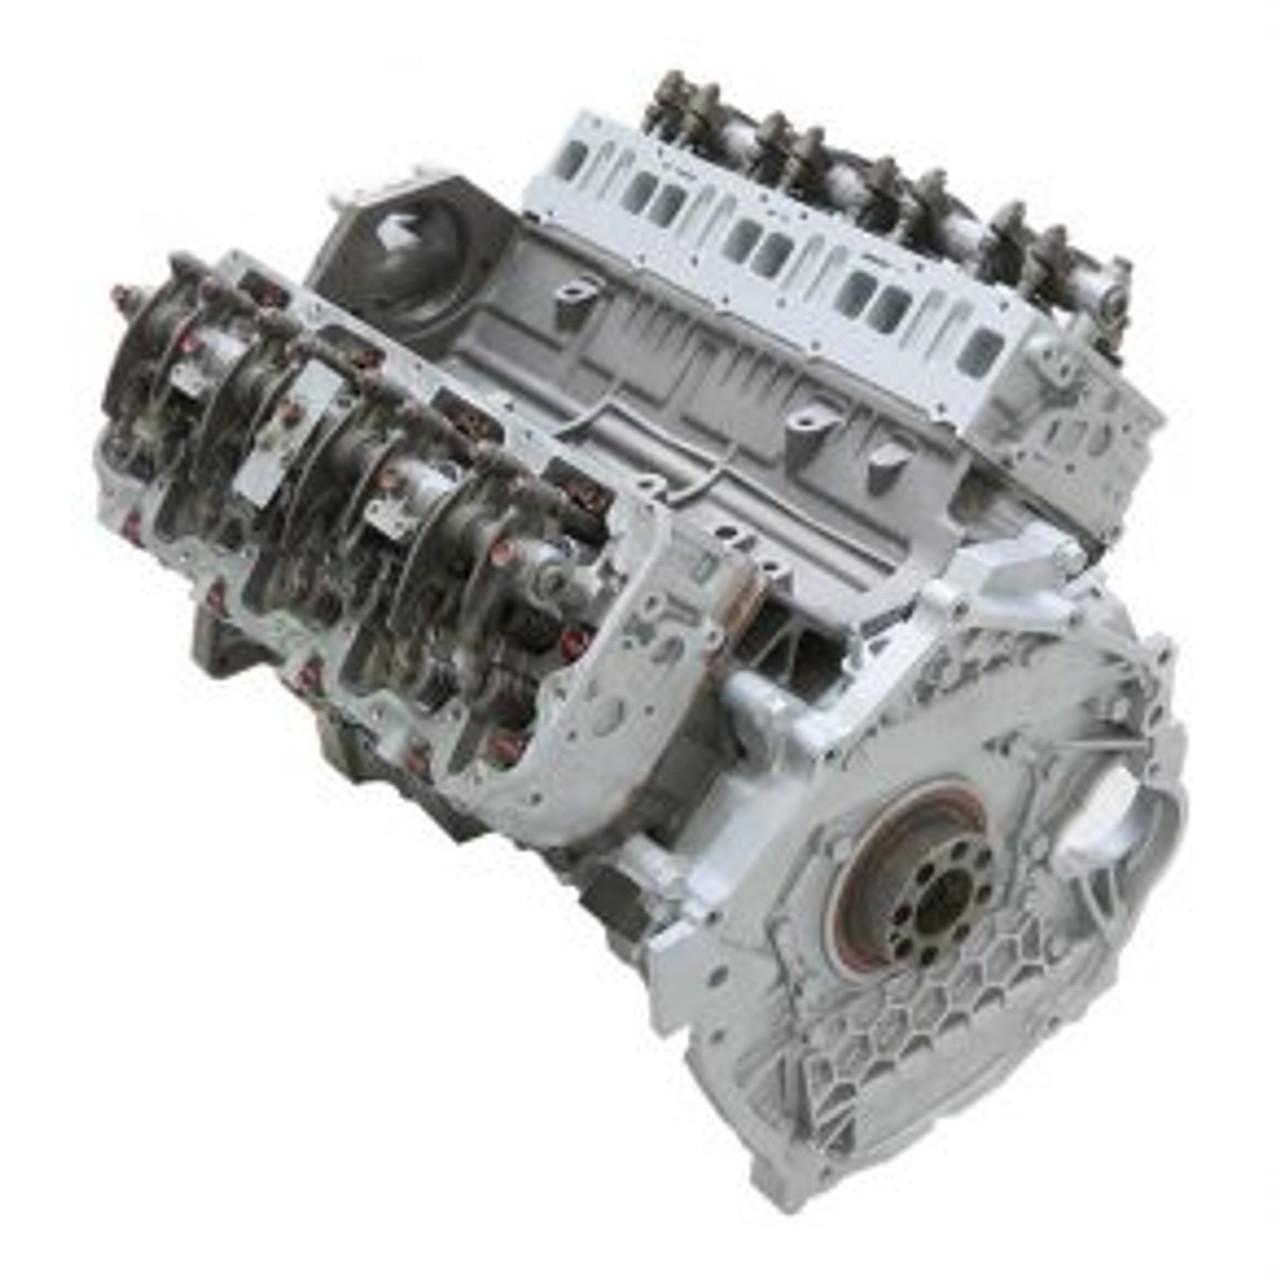 DFC Remanufacted 07.5-10 Duramax 6.6 LMM Long Block Engine